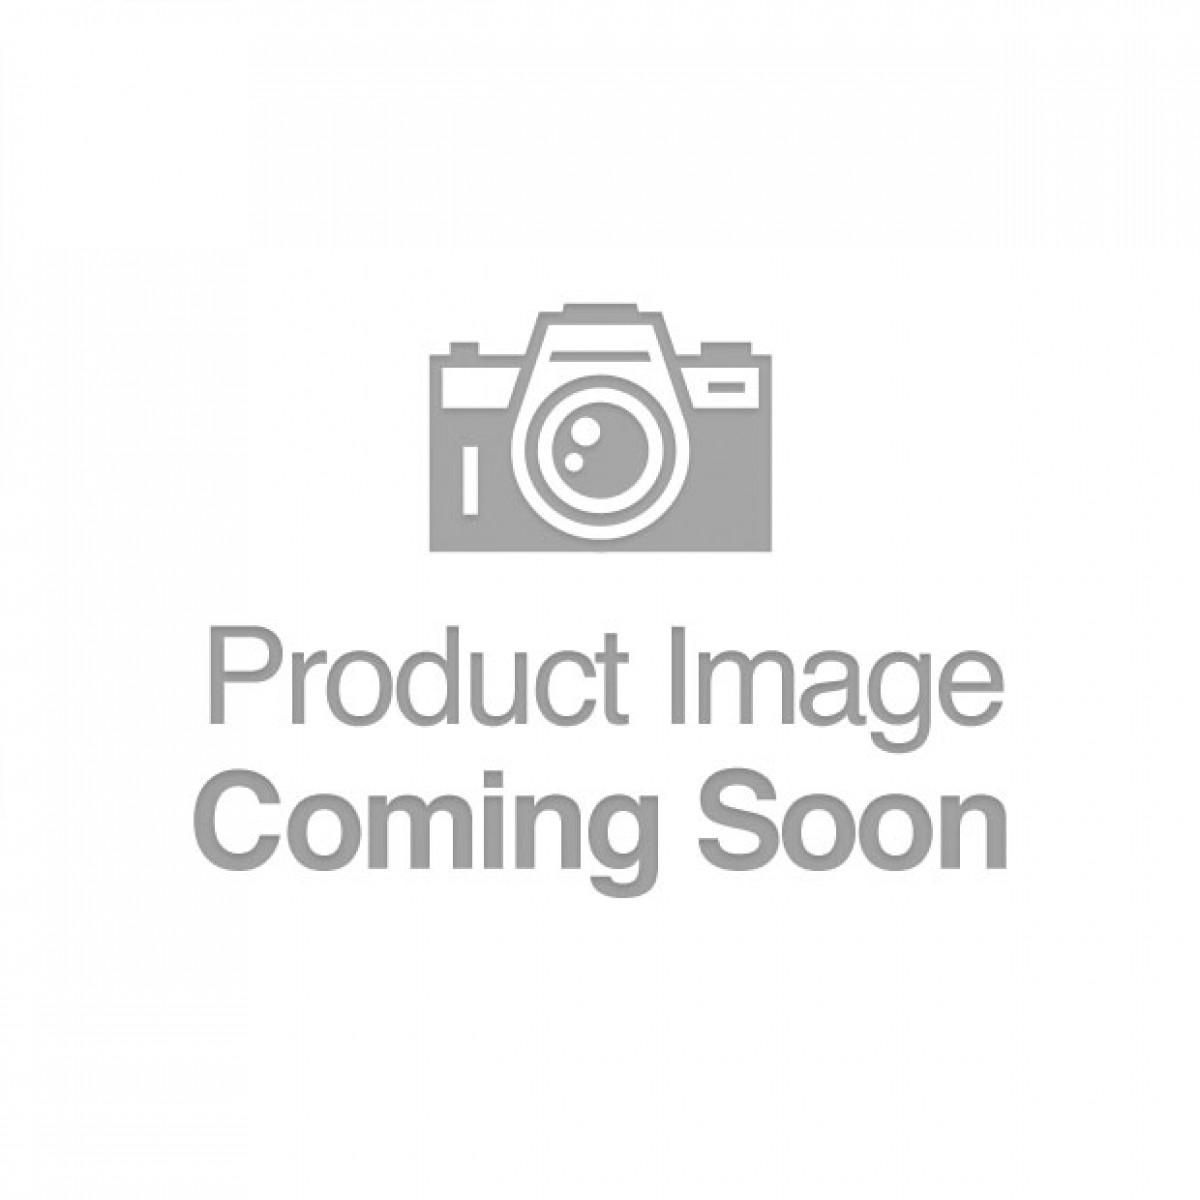 PDX Plus Pick Your Pleasure Stroker - Ivory